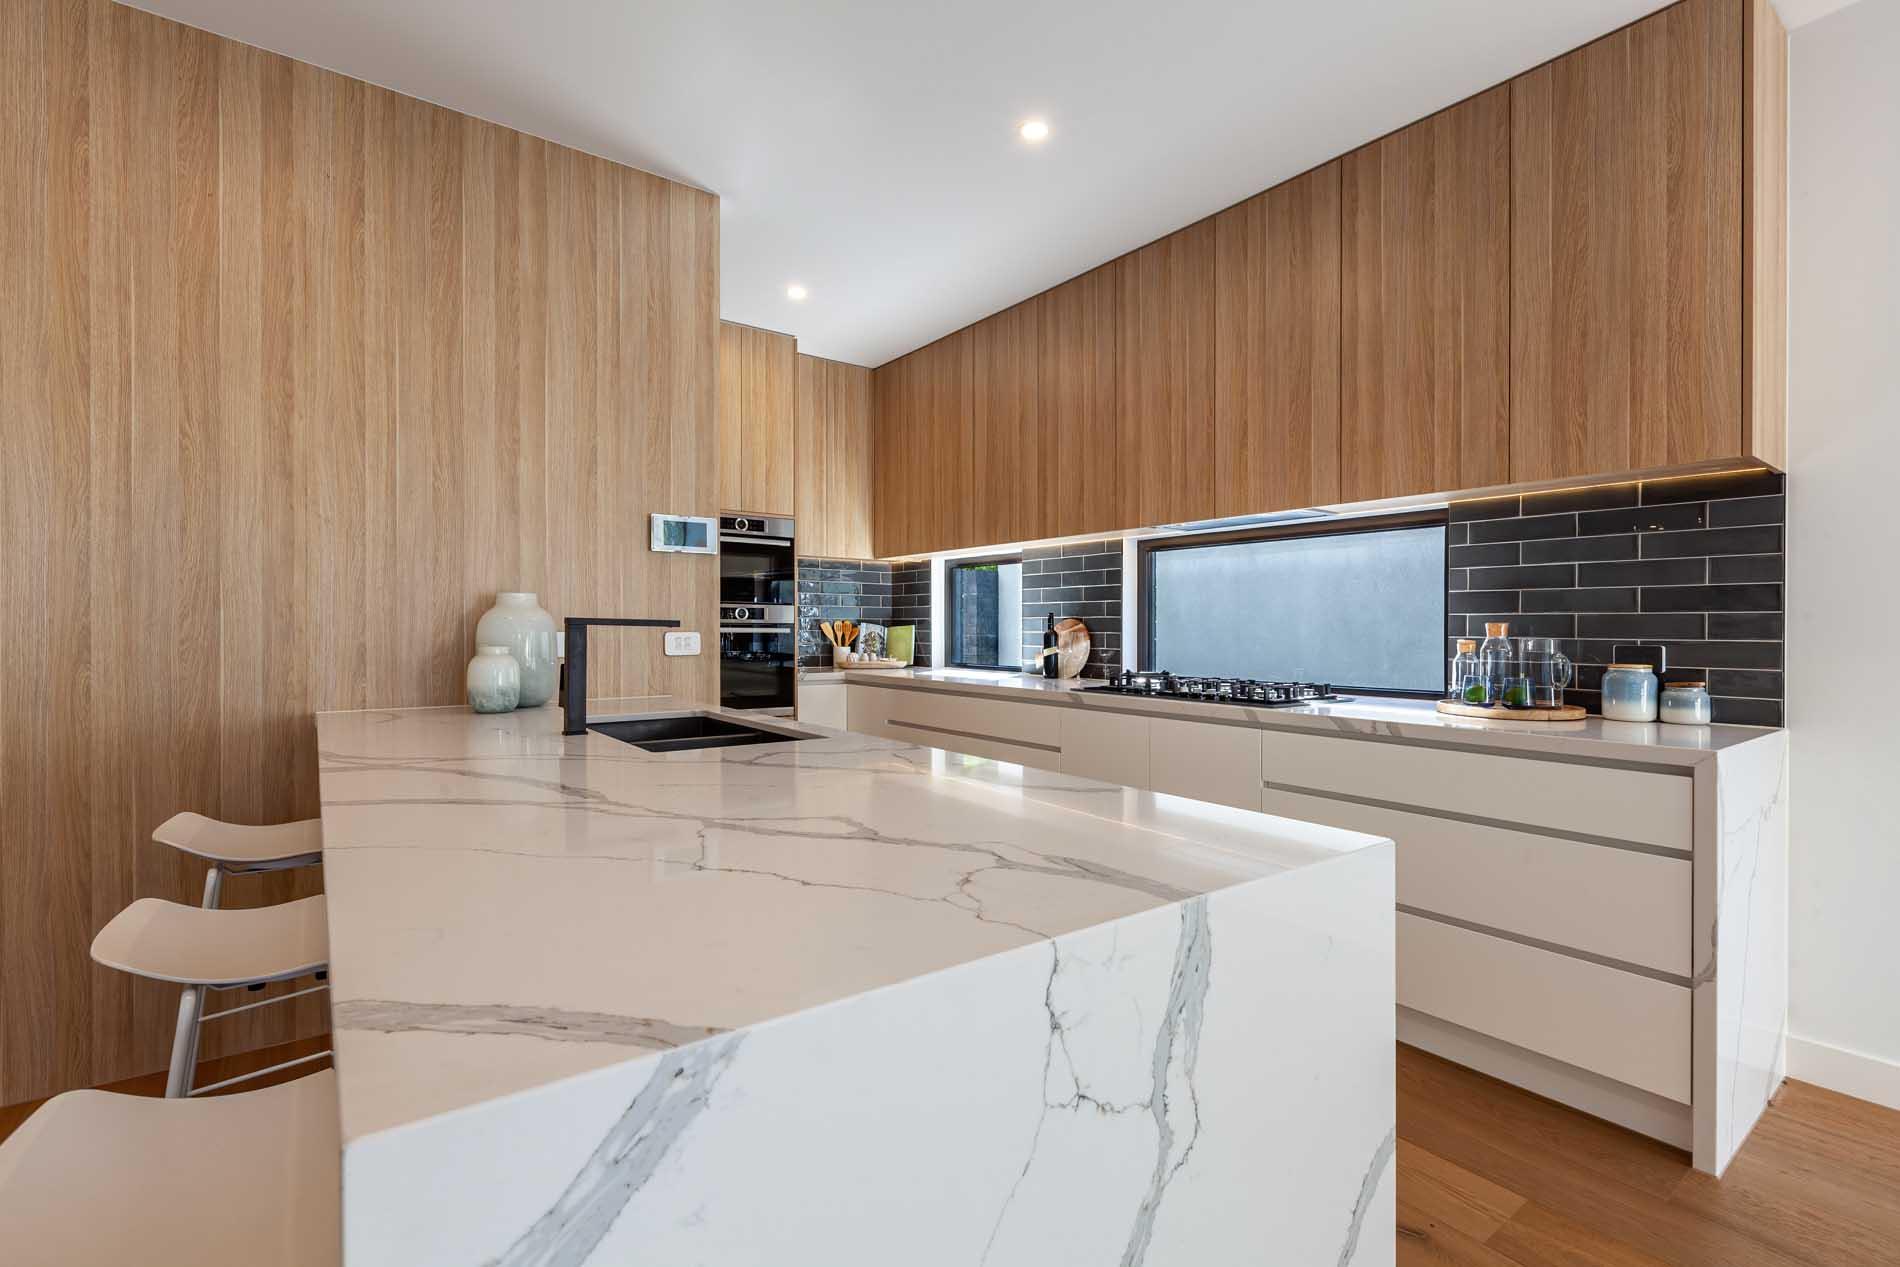 Dhursan Construction - Hillside kitchen